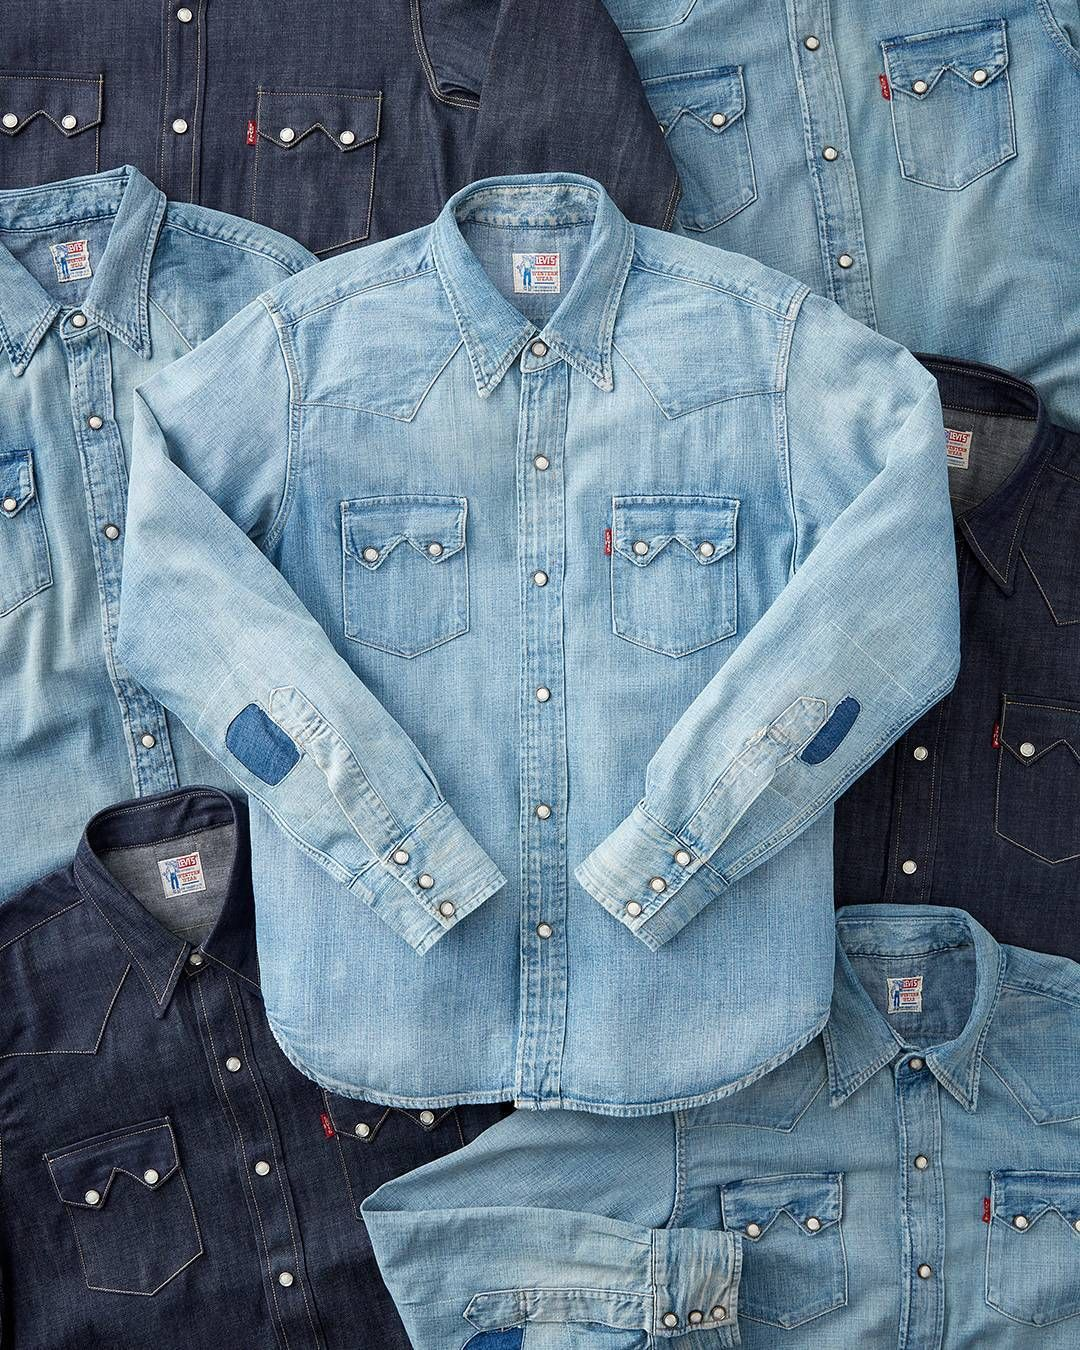 a54fa7c9a796 5,720 Likes, 27 Comments - LEVI'S VINTAGE CLOTHING (@levis.vintage.clothing